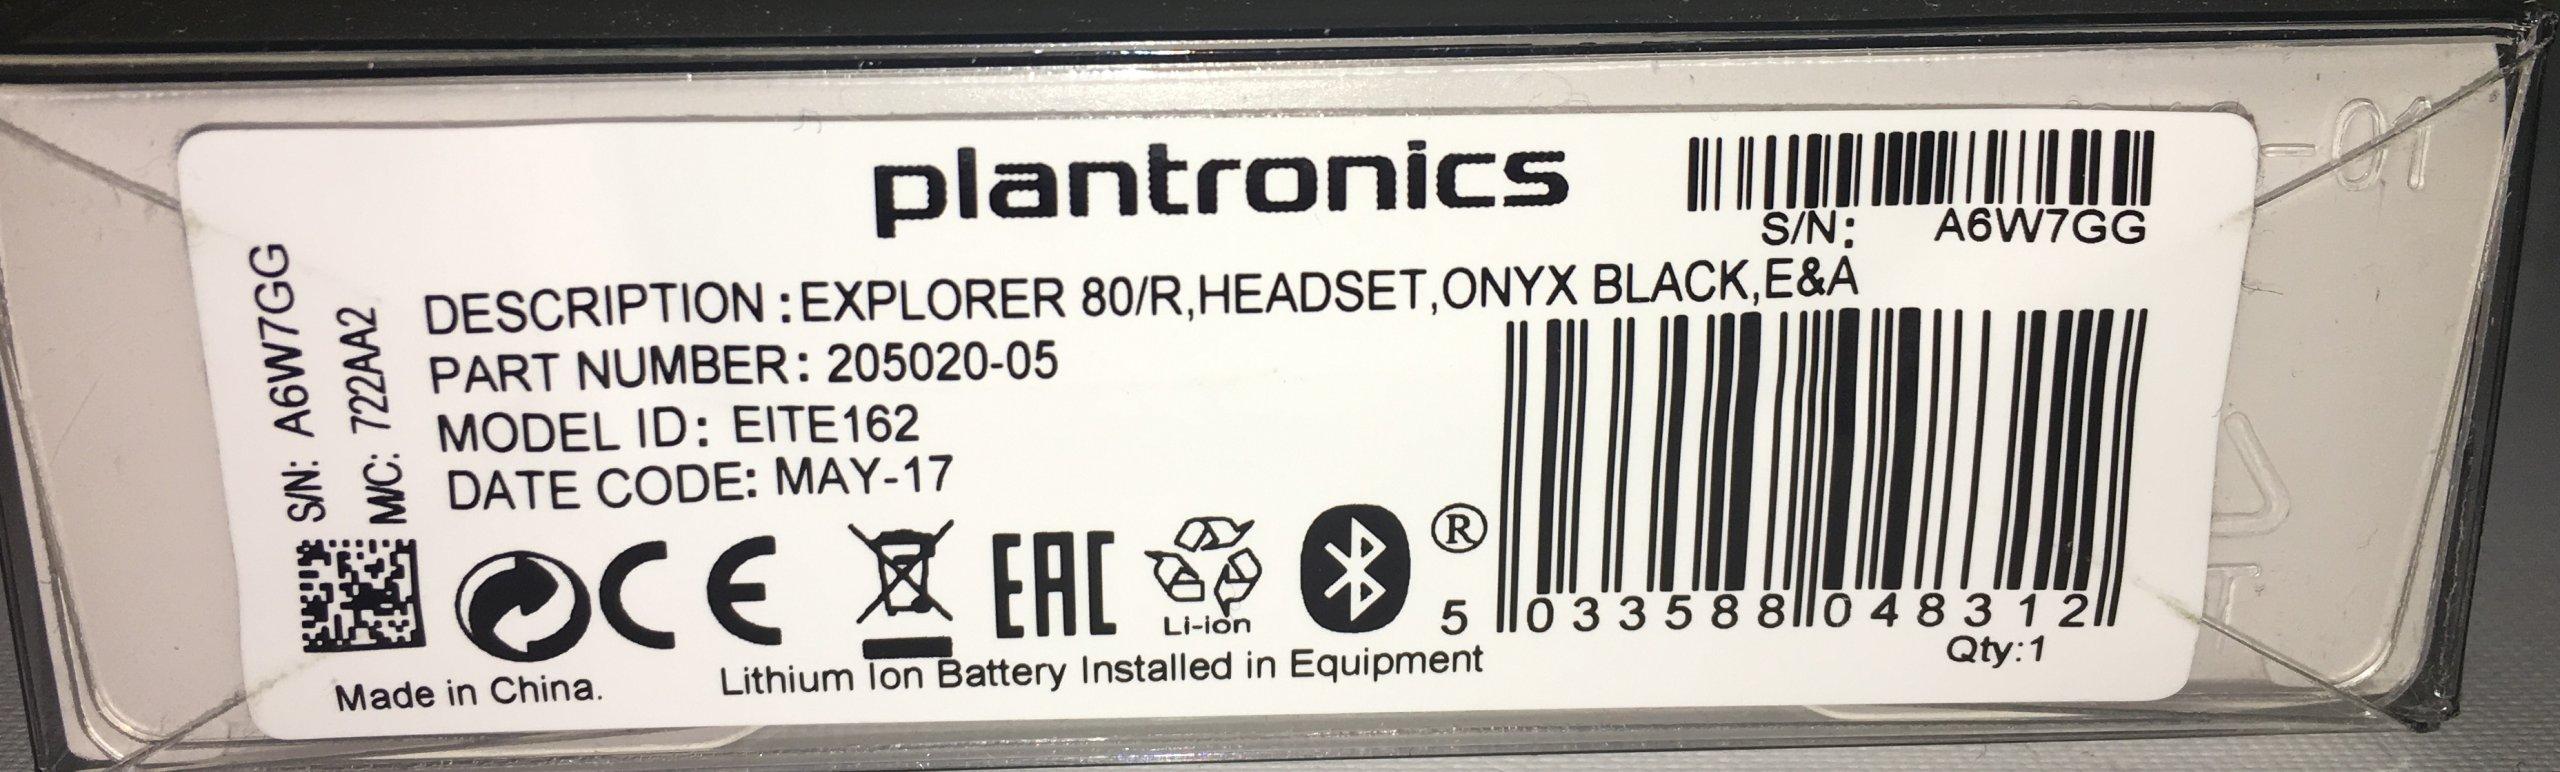 3f93a663cd5 Nowa Słuchawka Bluetooth PLANTRONICS Explorer 80 - 7181894046 ...